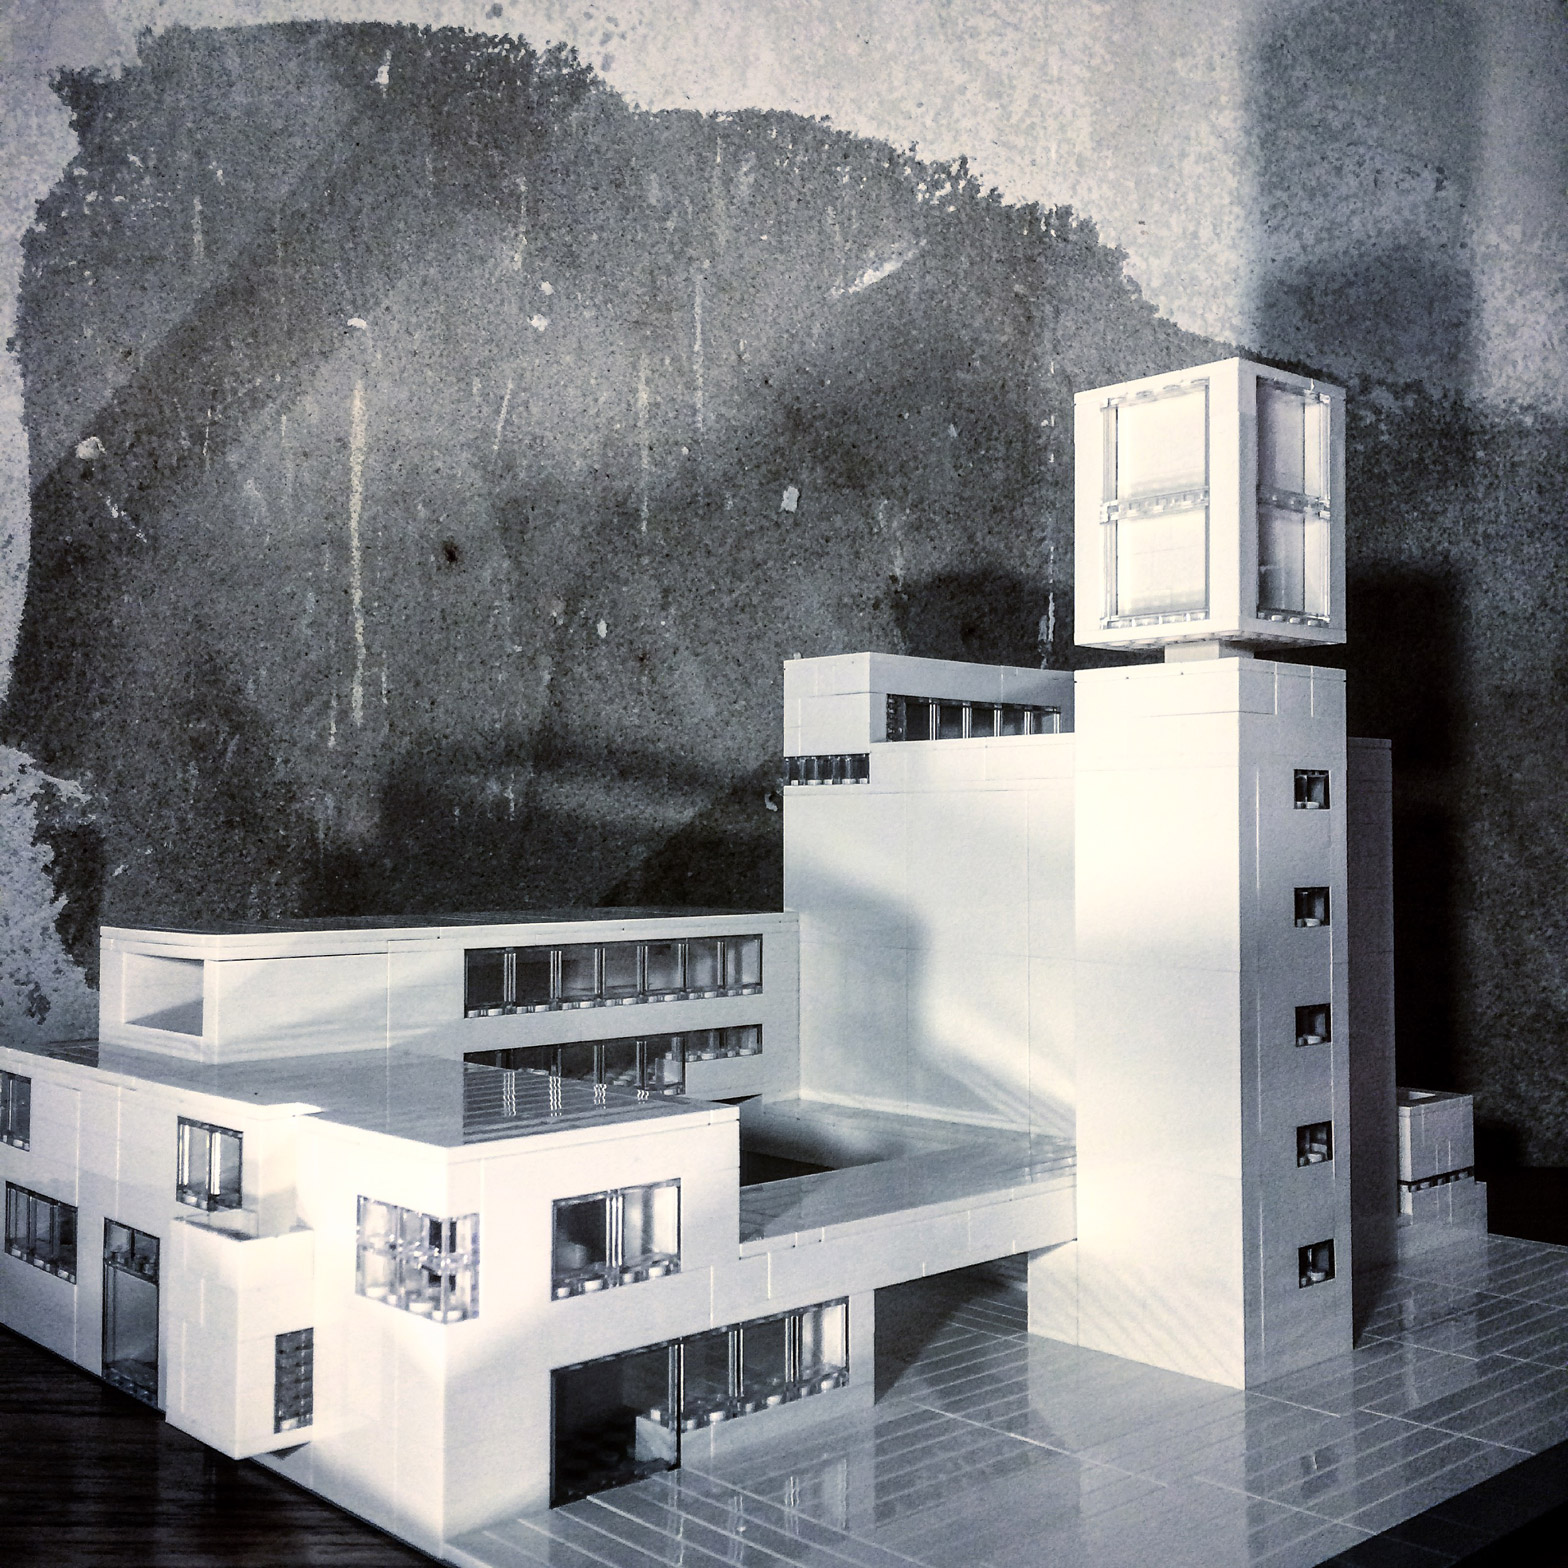 Iglesia de Santa Inés, en Berlín, diseño de Werner Düttmann - Arndt Schlaudraff